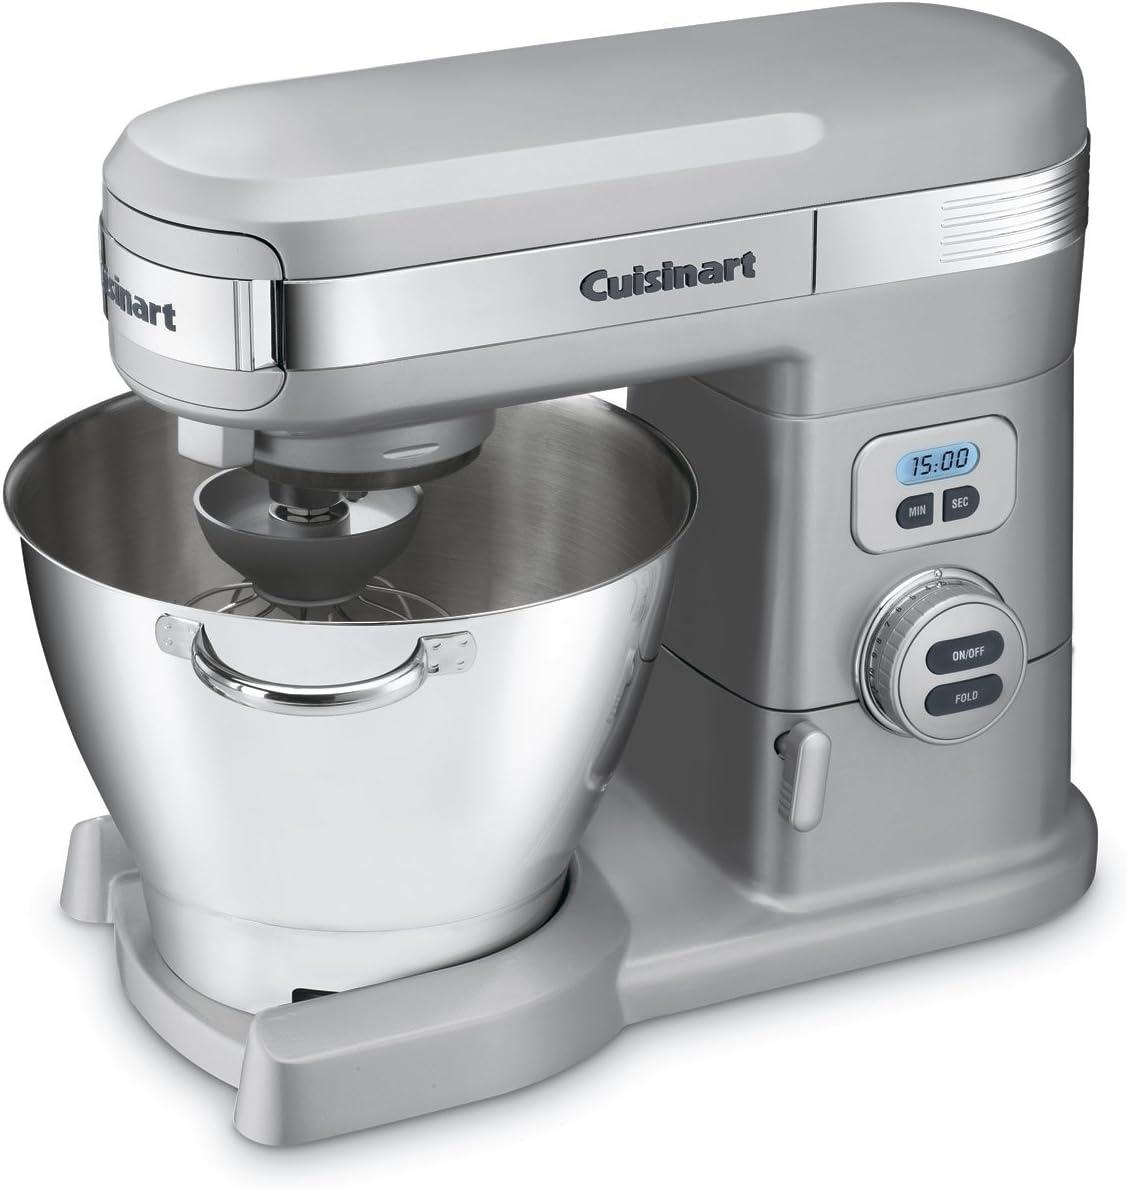 Cuisinart SM-55BC 5-1 2-Quart 12-Speed Stand Mixer, Brushed Chrome